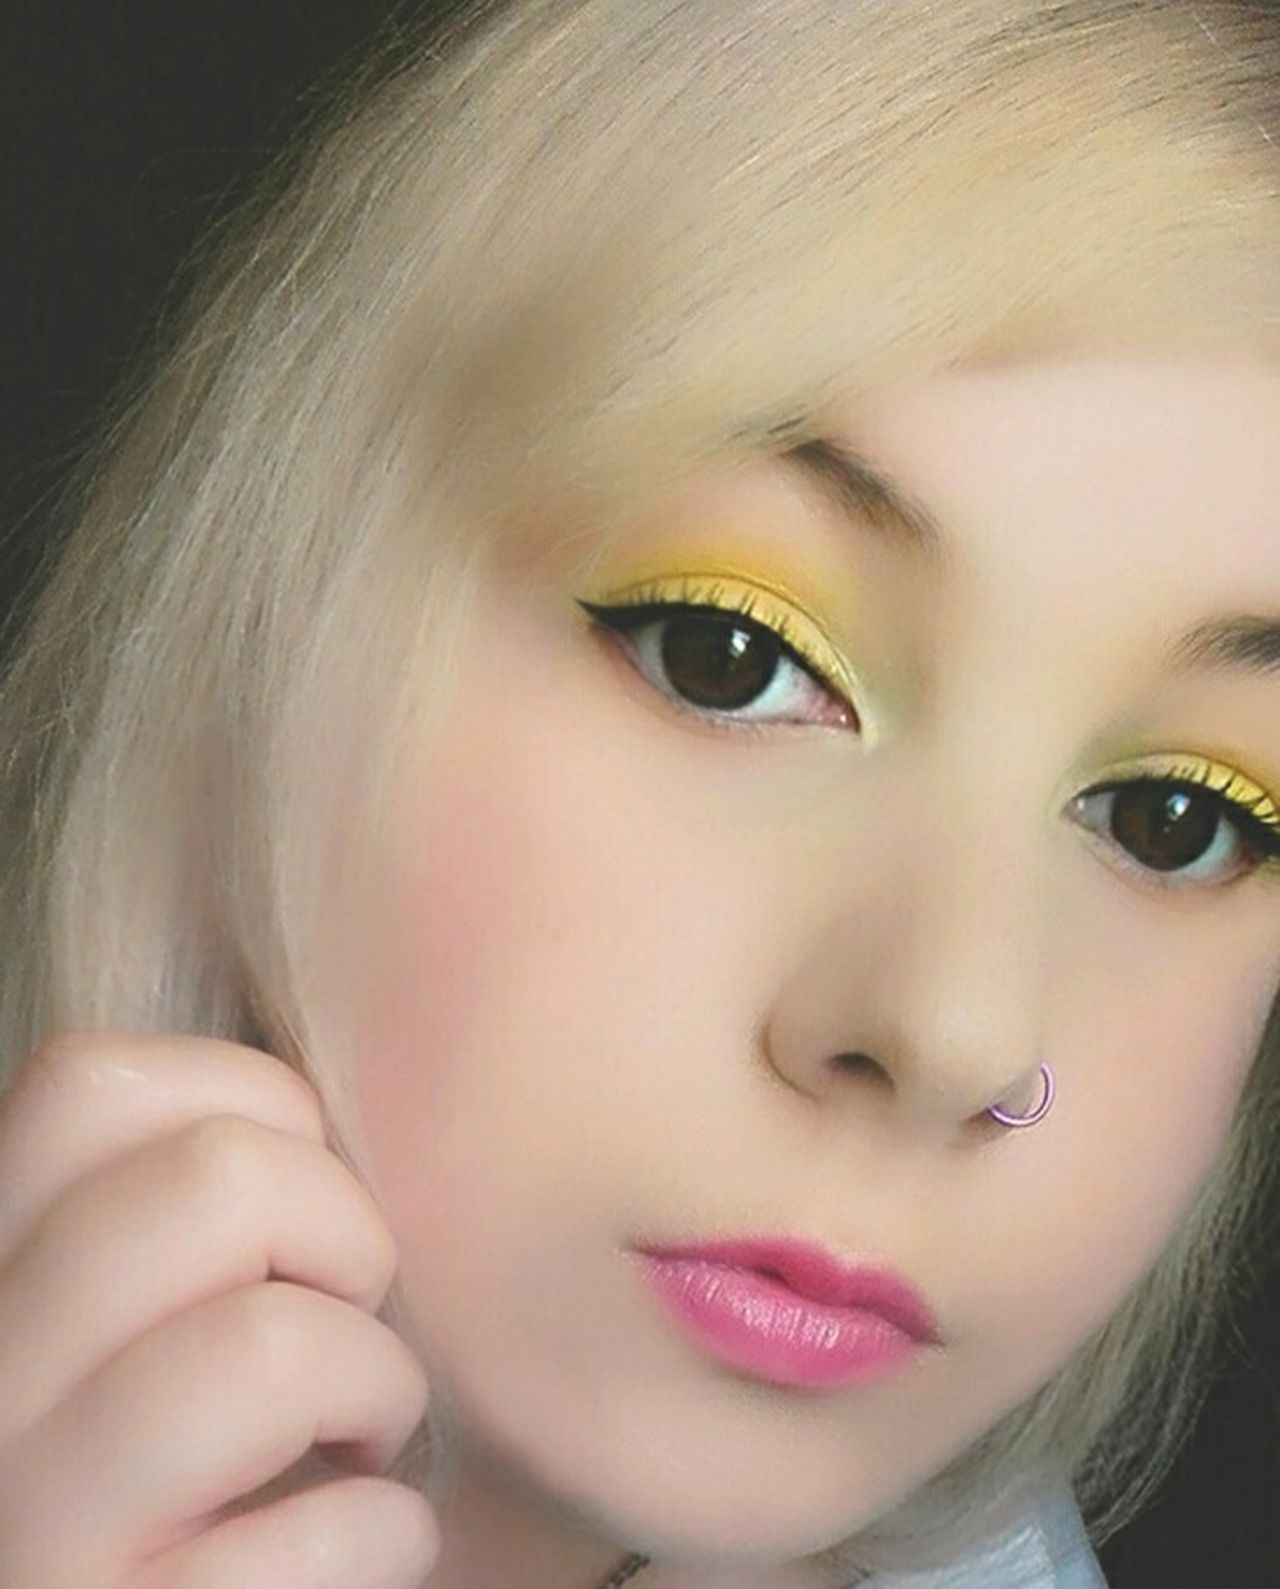 Me ThatsMe Selfie ✌ Selfies Self Portrait Selfie Portrait Portrait Likeforlike Portraits Selfietime Blonde Hair Short Hair Eyes Lips Lipstick Makeup Girl Woman Piercing Alternativegirl Blonde One Person Plugs Picoftheday Photooftheday